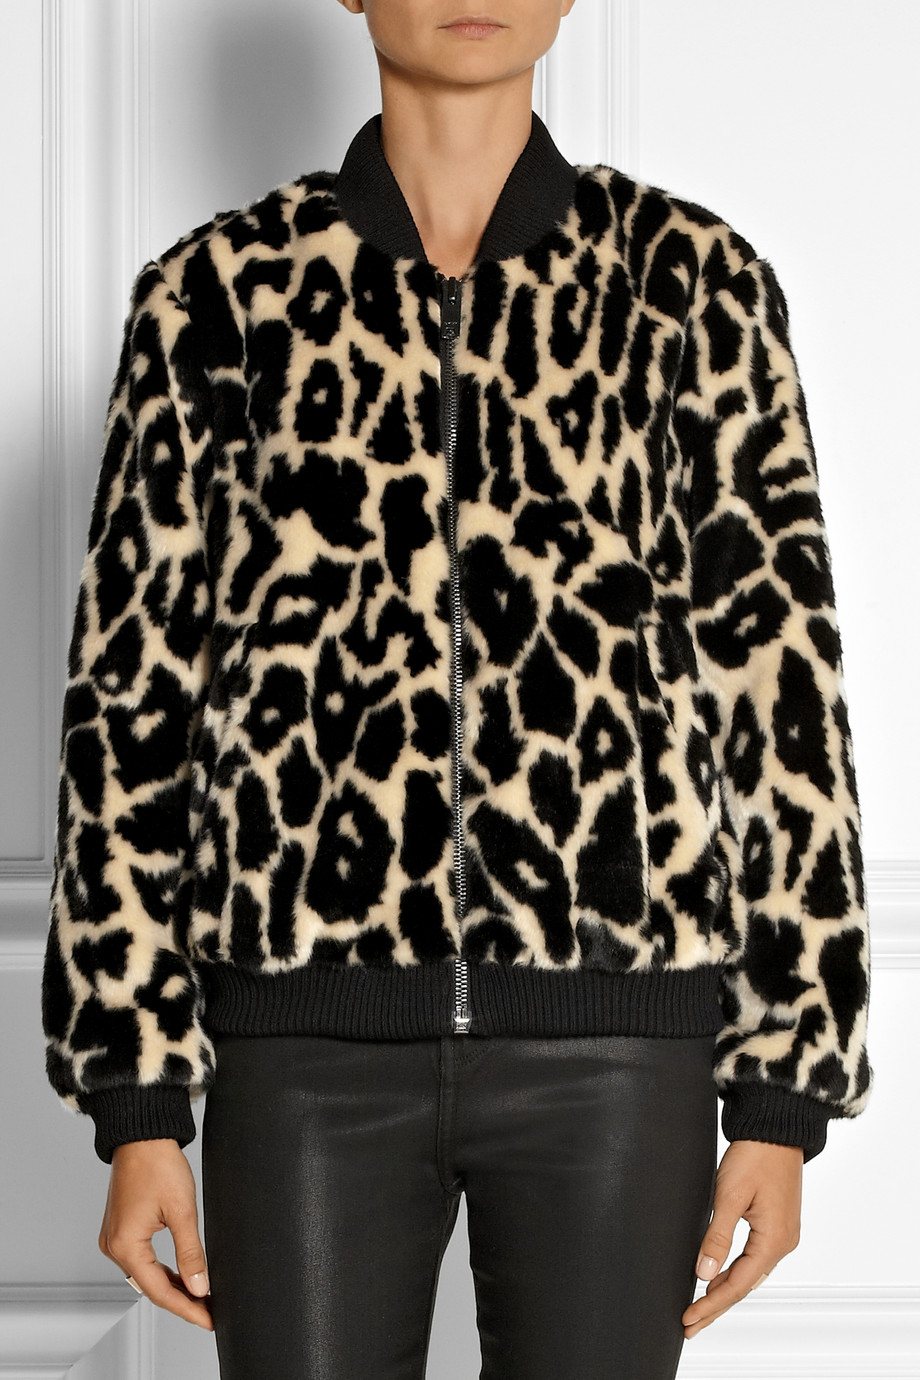 d1bed1c5a DKNY Leopard-Print Faux Fur Bomber Jacket in Black - Lyst